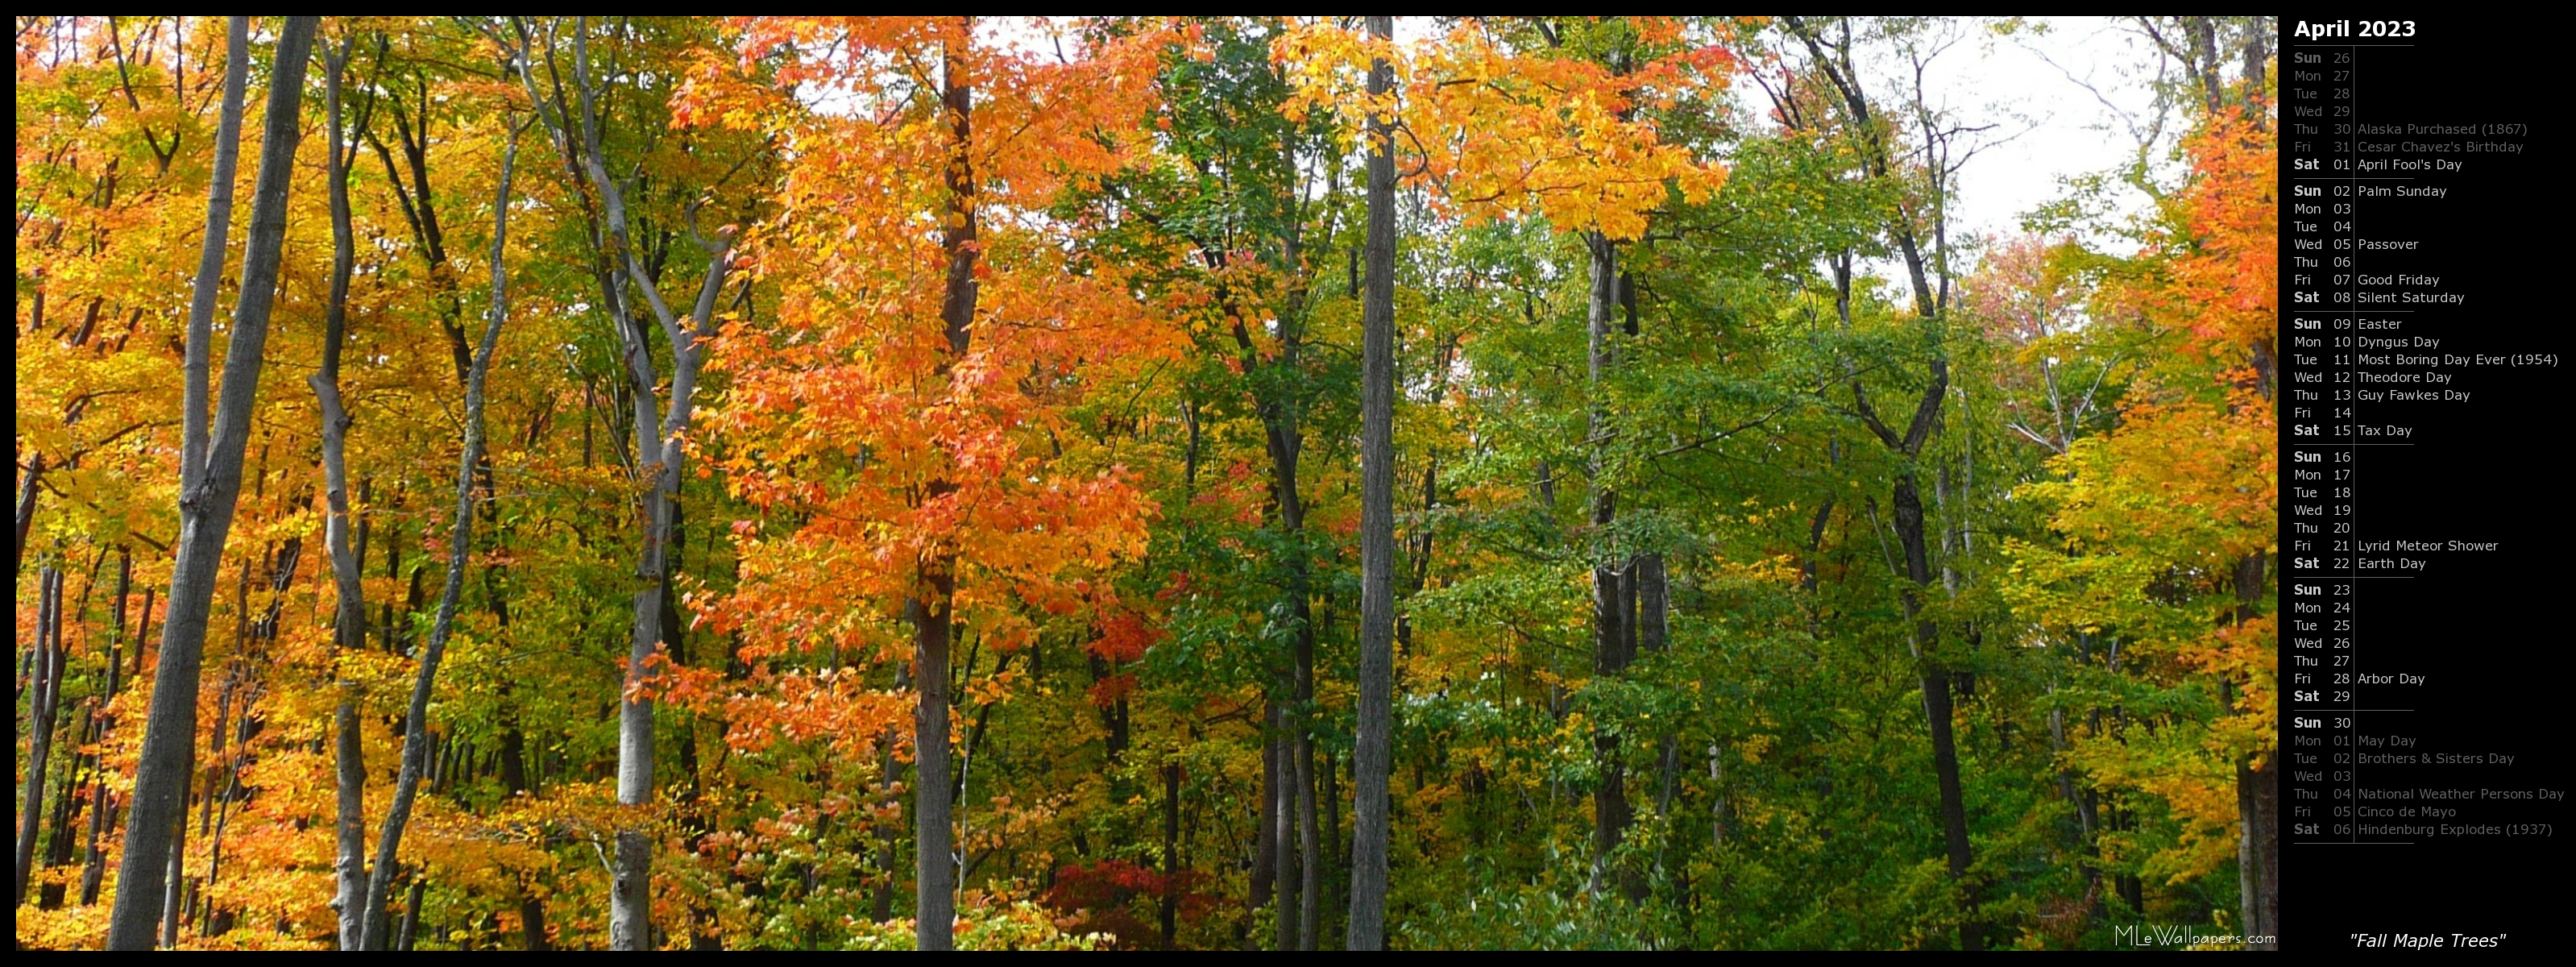 MLeWallpapers.com - Fall Maple Trees (Calendar)